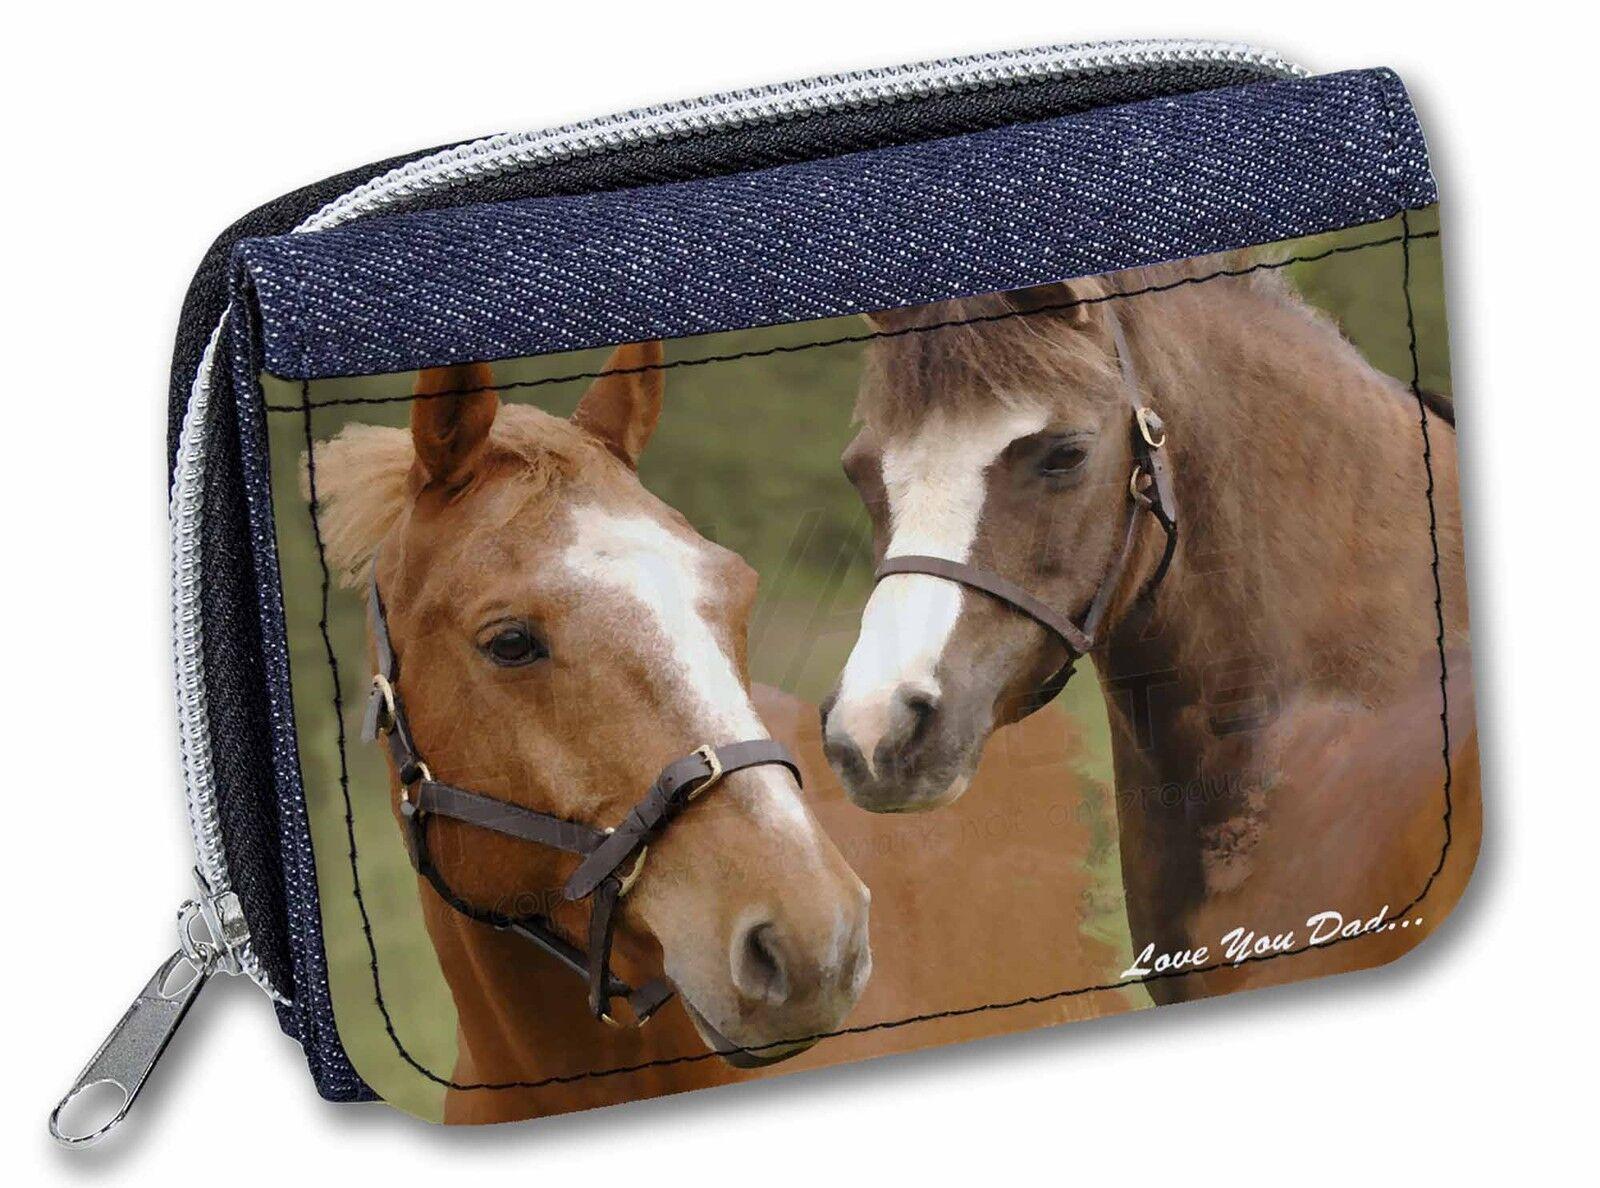 Horse Montage 'Love You Dad' Girls/Ladies Denim Purse Wallet Christma, DAD-142JW